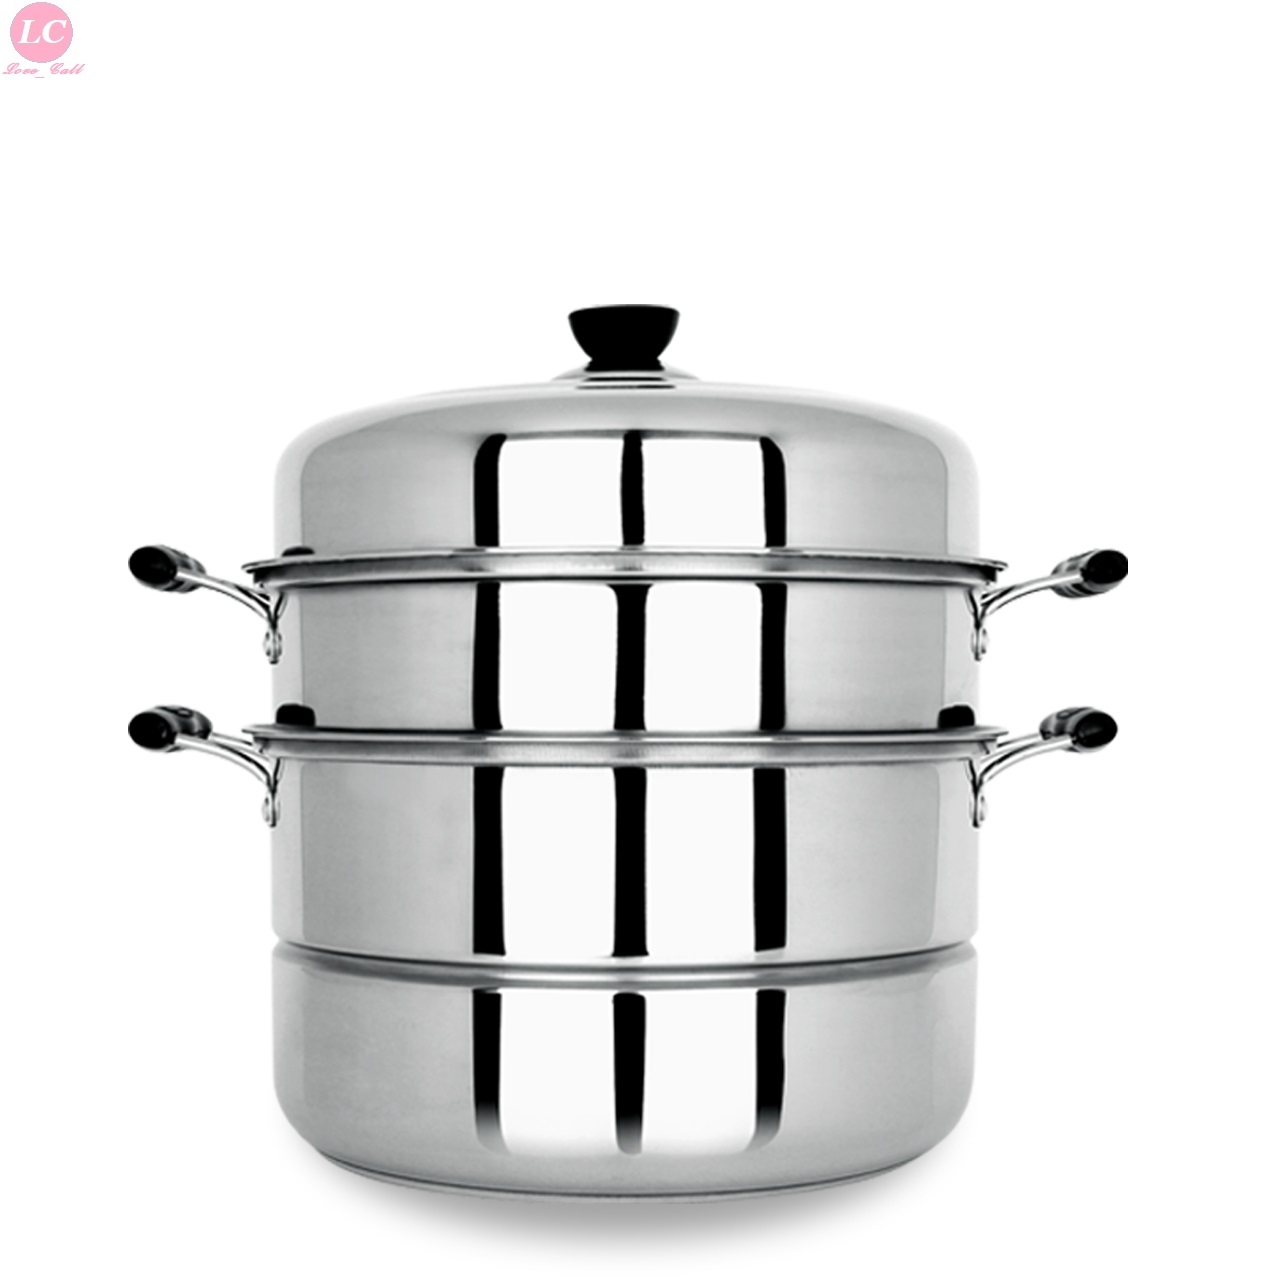 Vaporizador de cocina hogar Acero inoxidable 3 capas 28 cm cocina gruesa al vapor 13 litros utensilios de cocina-in Ollas de vapor from Hogar y Mascotas    1